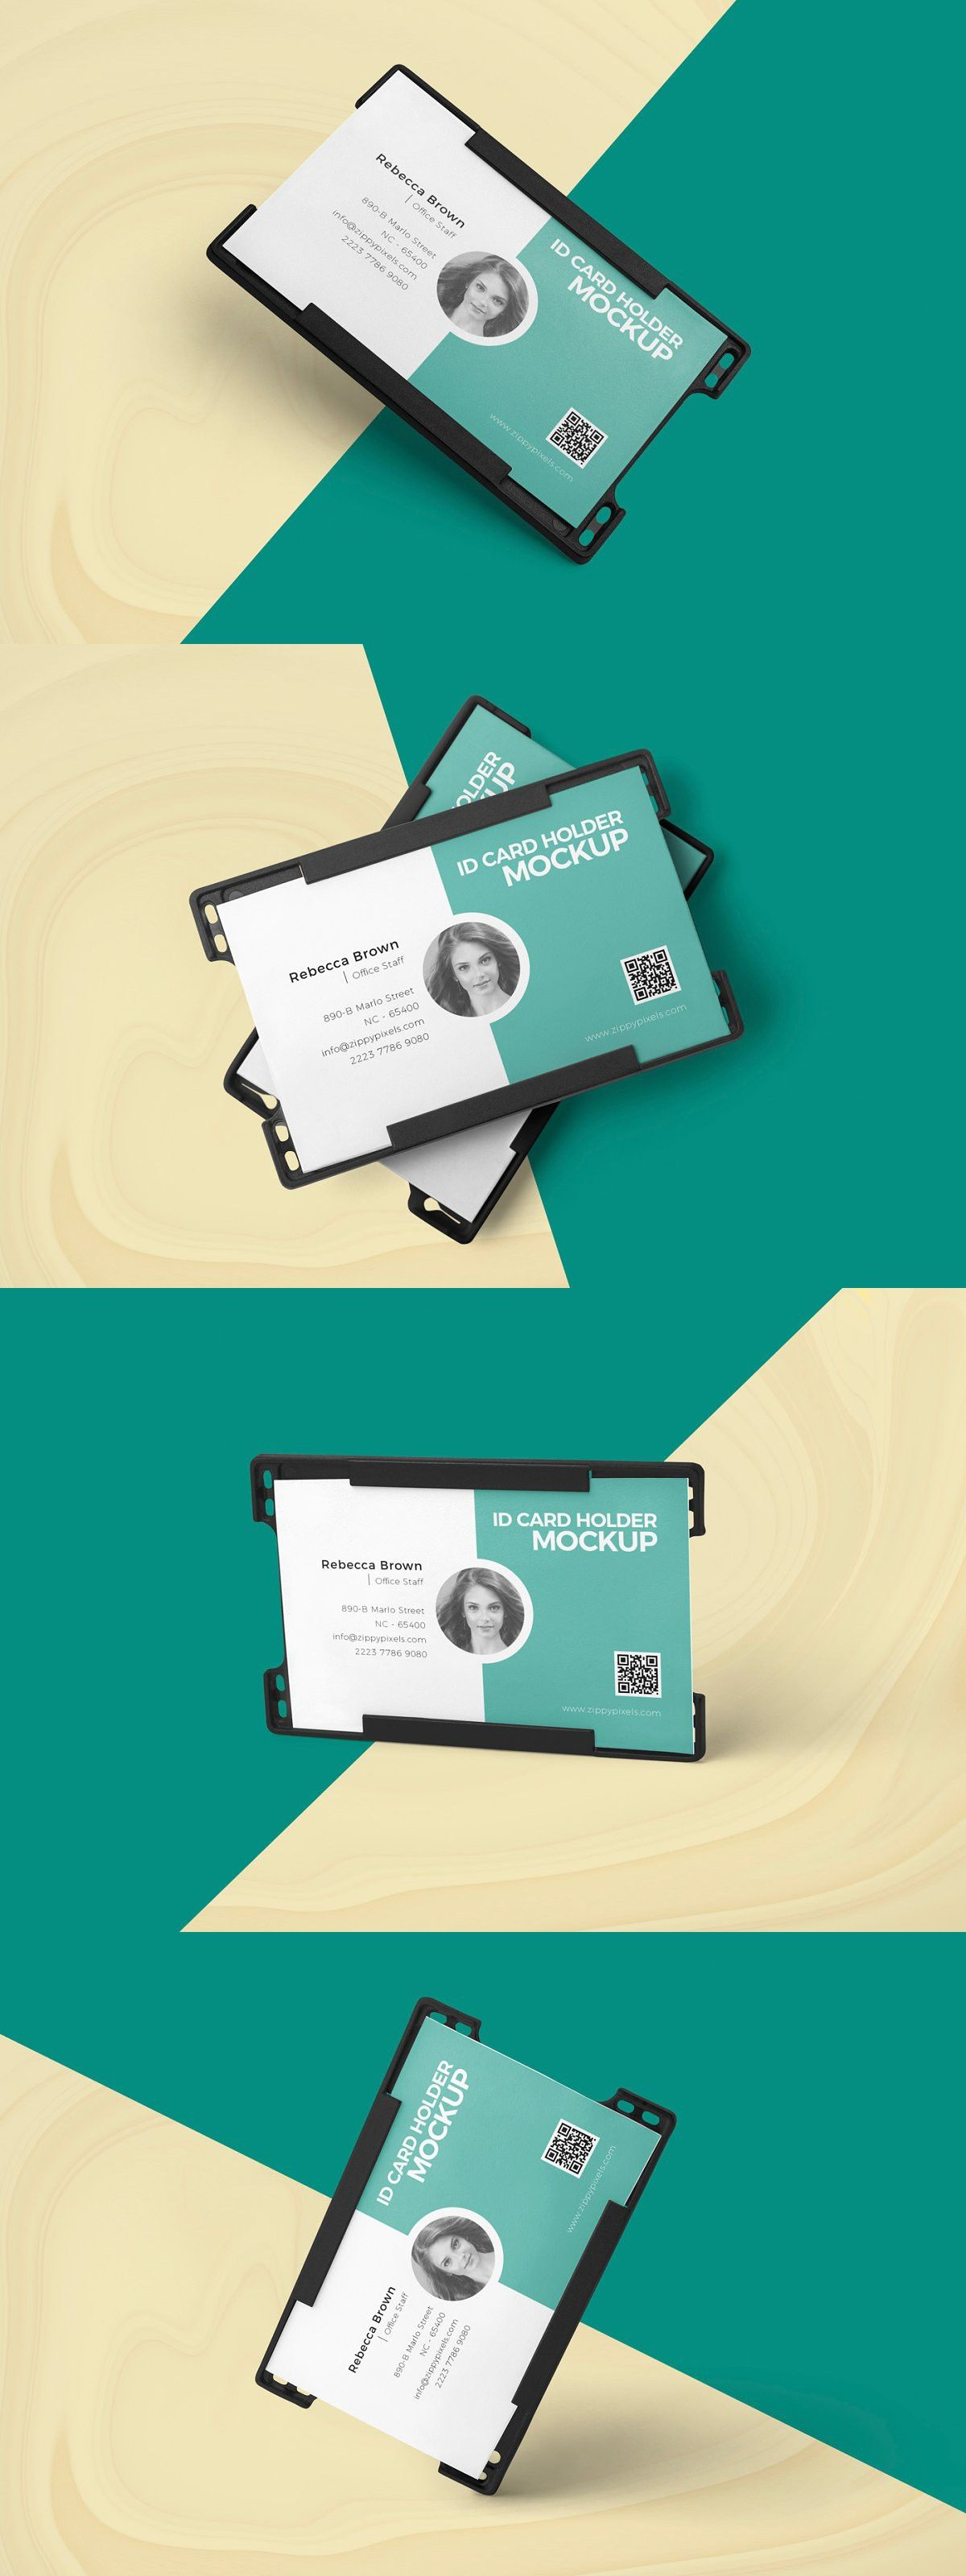 Id Card Holder Mockups Visiting Card Design Stationery Templates Visiting Cards